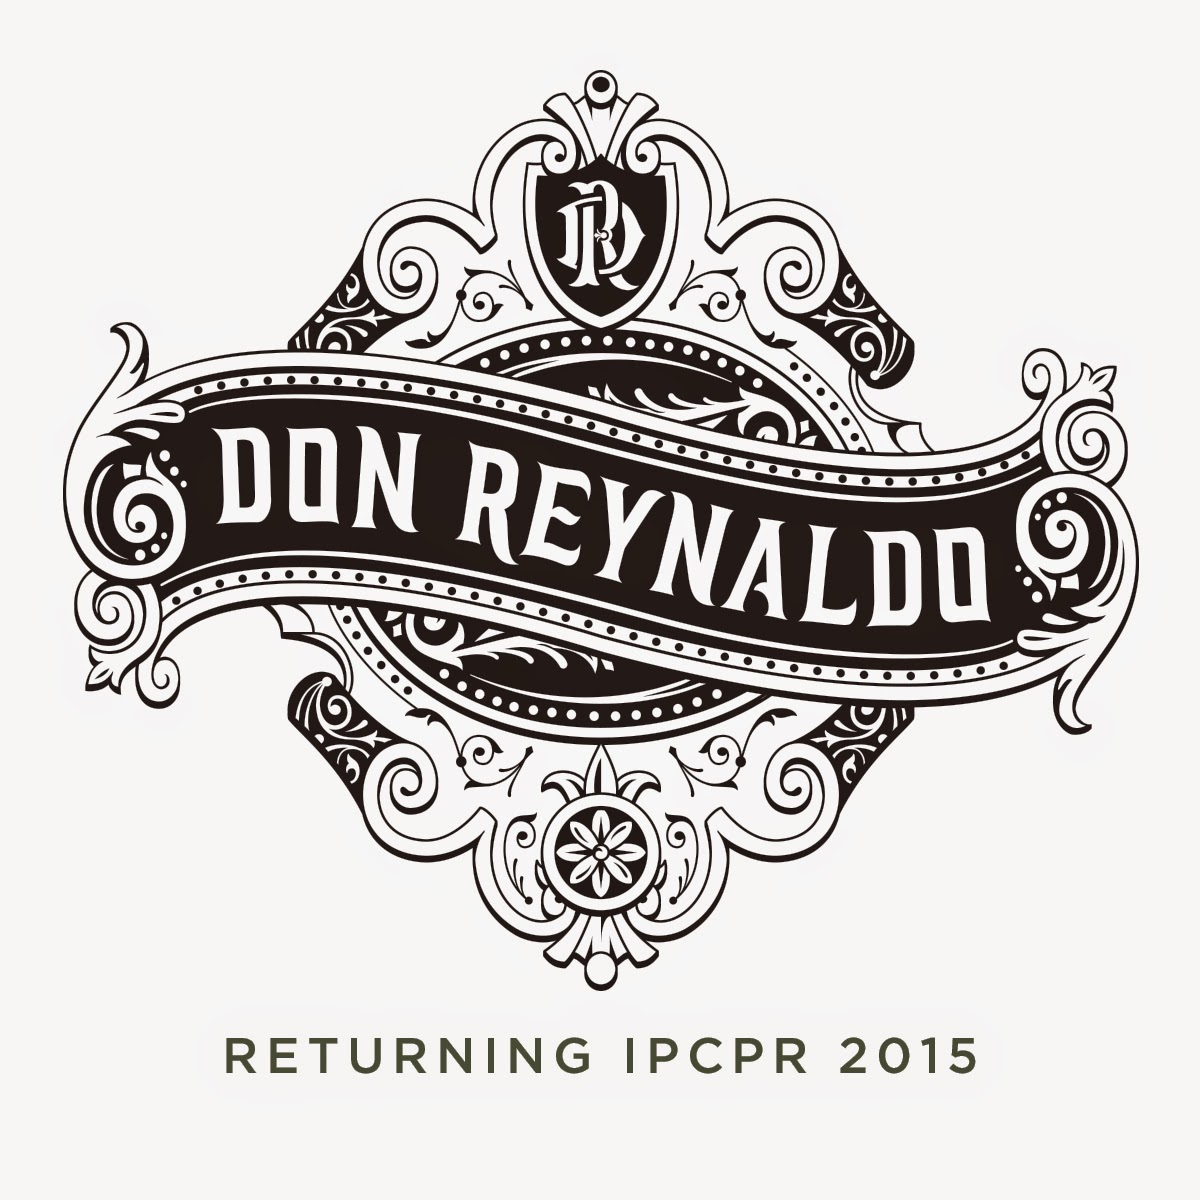 Cigar News: Warped Cigars' Don Reynaldo Returning at 2015 IPCPR